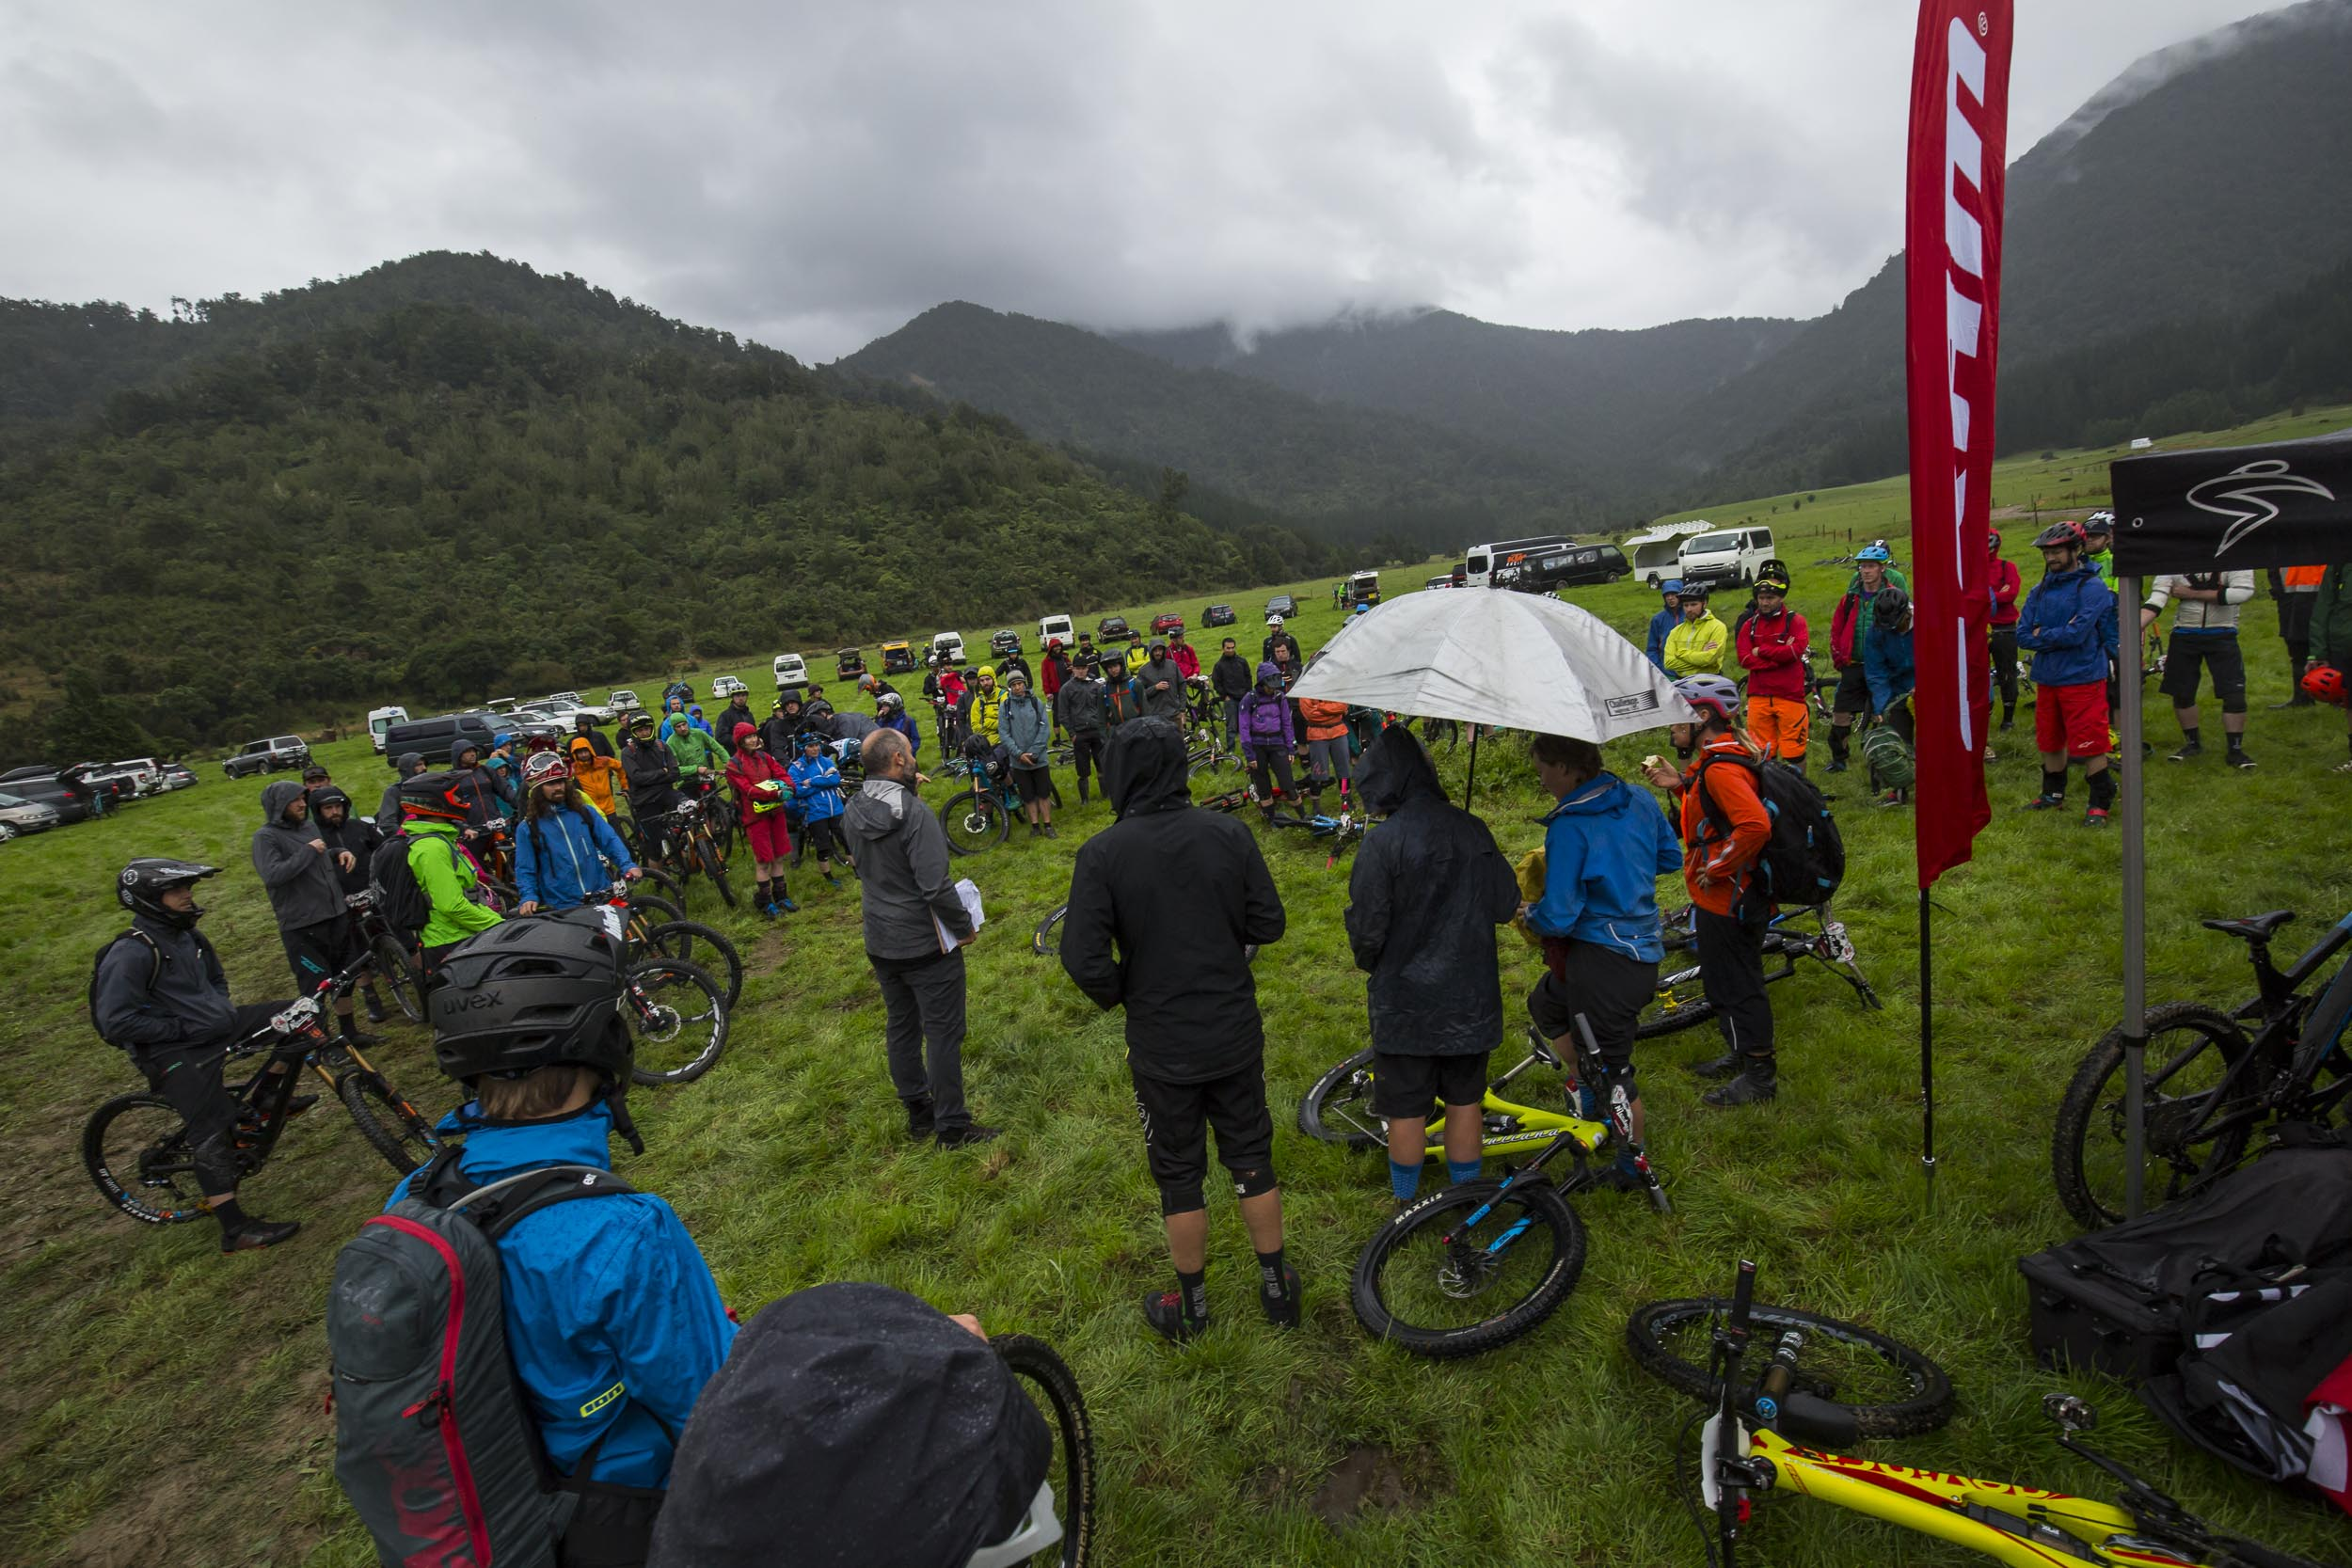 NK_NZ_Enduro_Day2-1.jpg